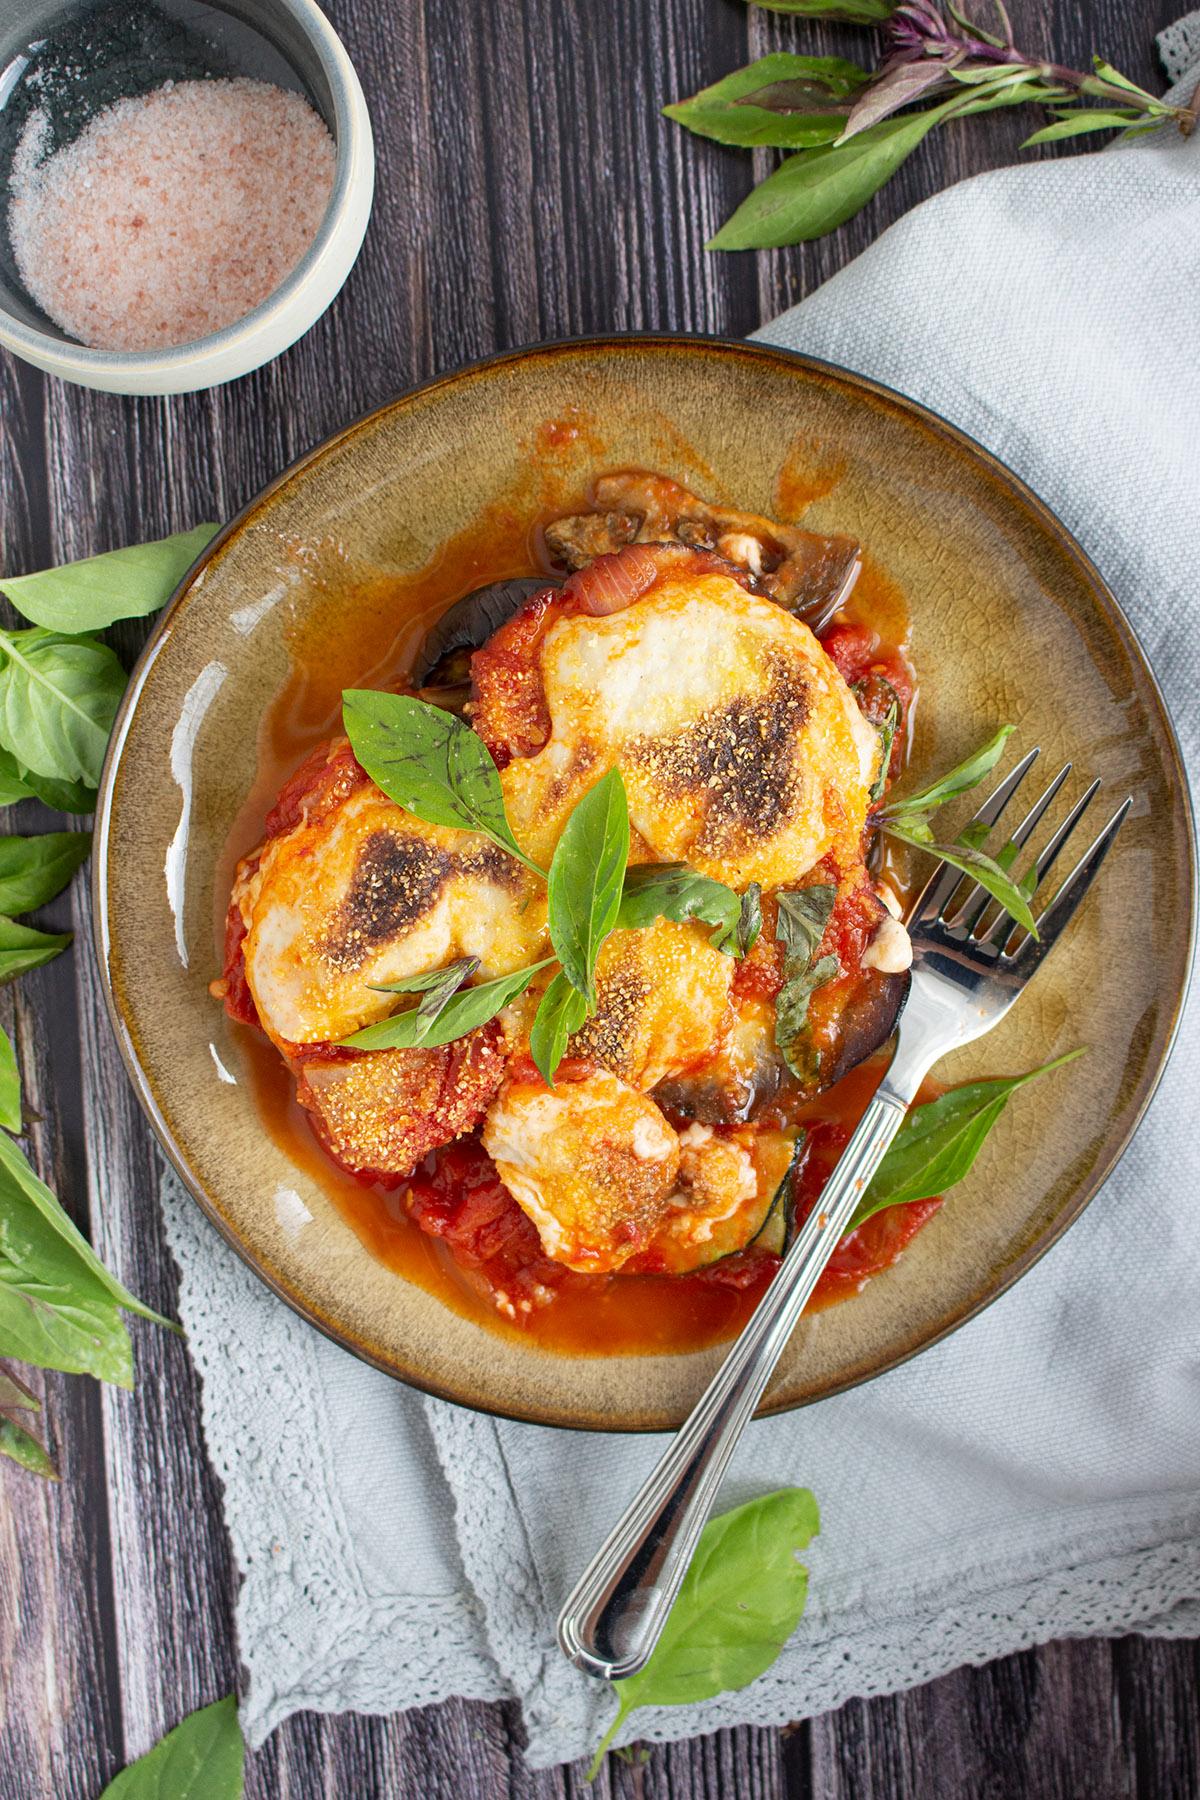 Auberginen Parmigiana mit veganem Käse, Veganer Käse